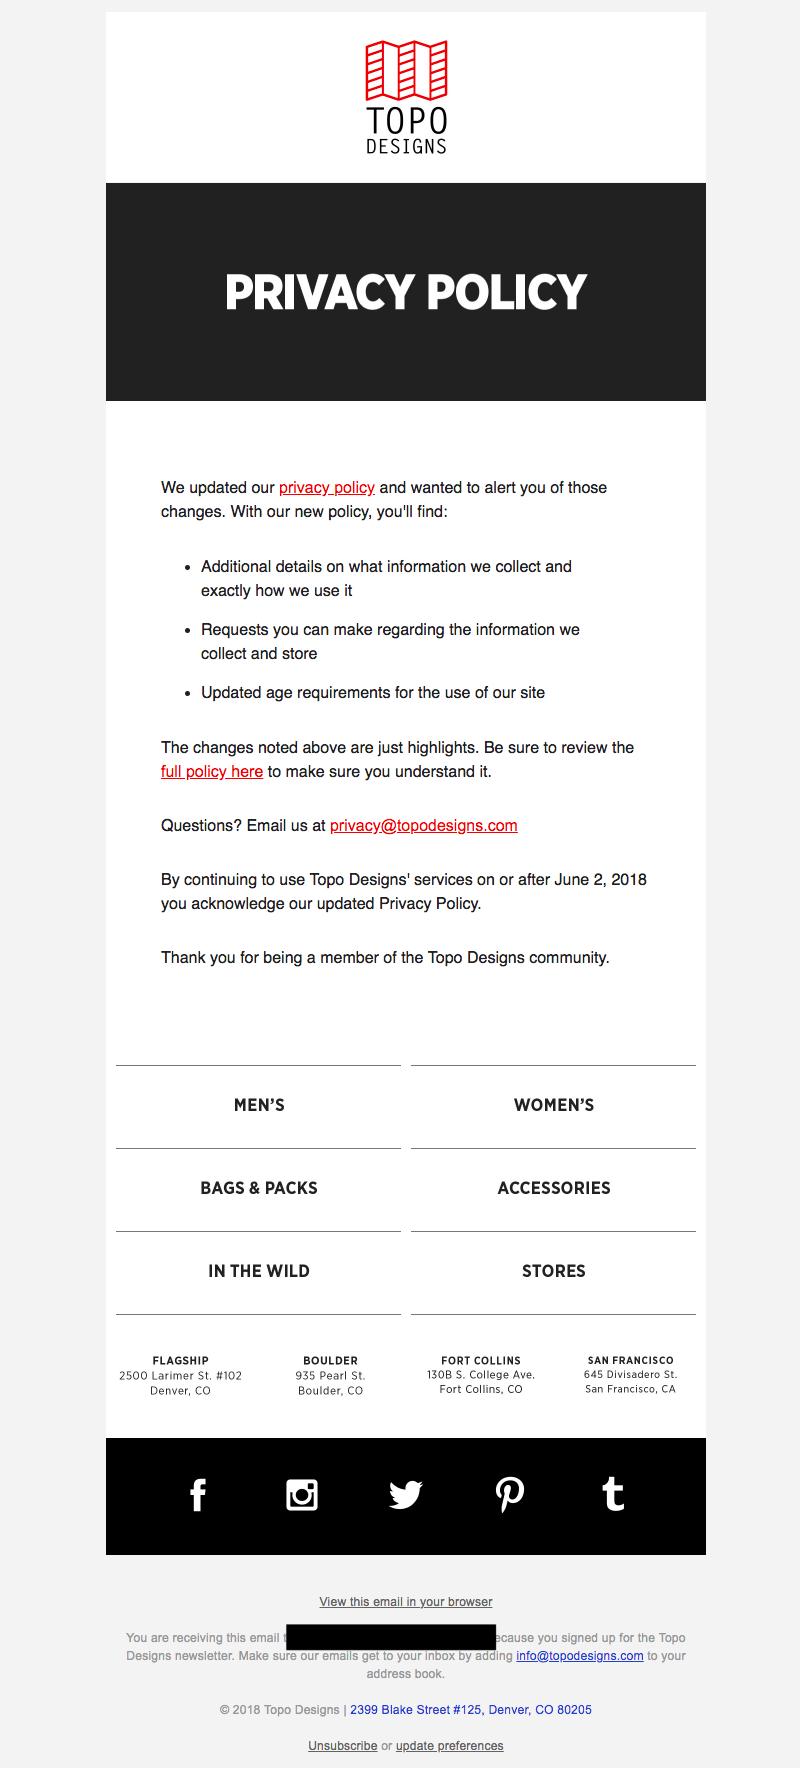 Topo Designs GDPR emails